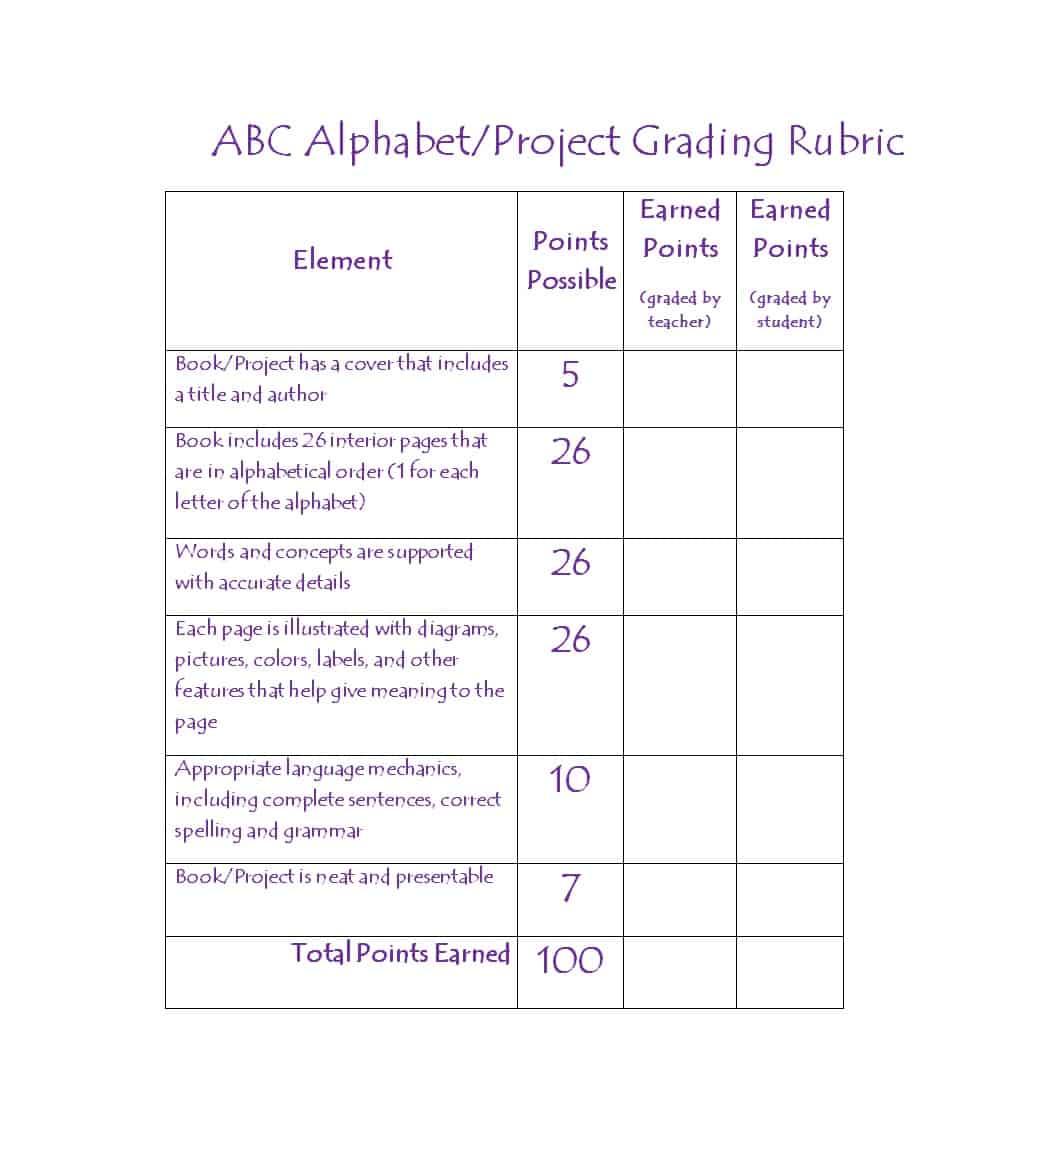 46 Editable Rubric Templates (Word Format) ᐅ Template Lab Regarding Grading Rubric Template Word